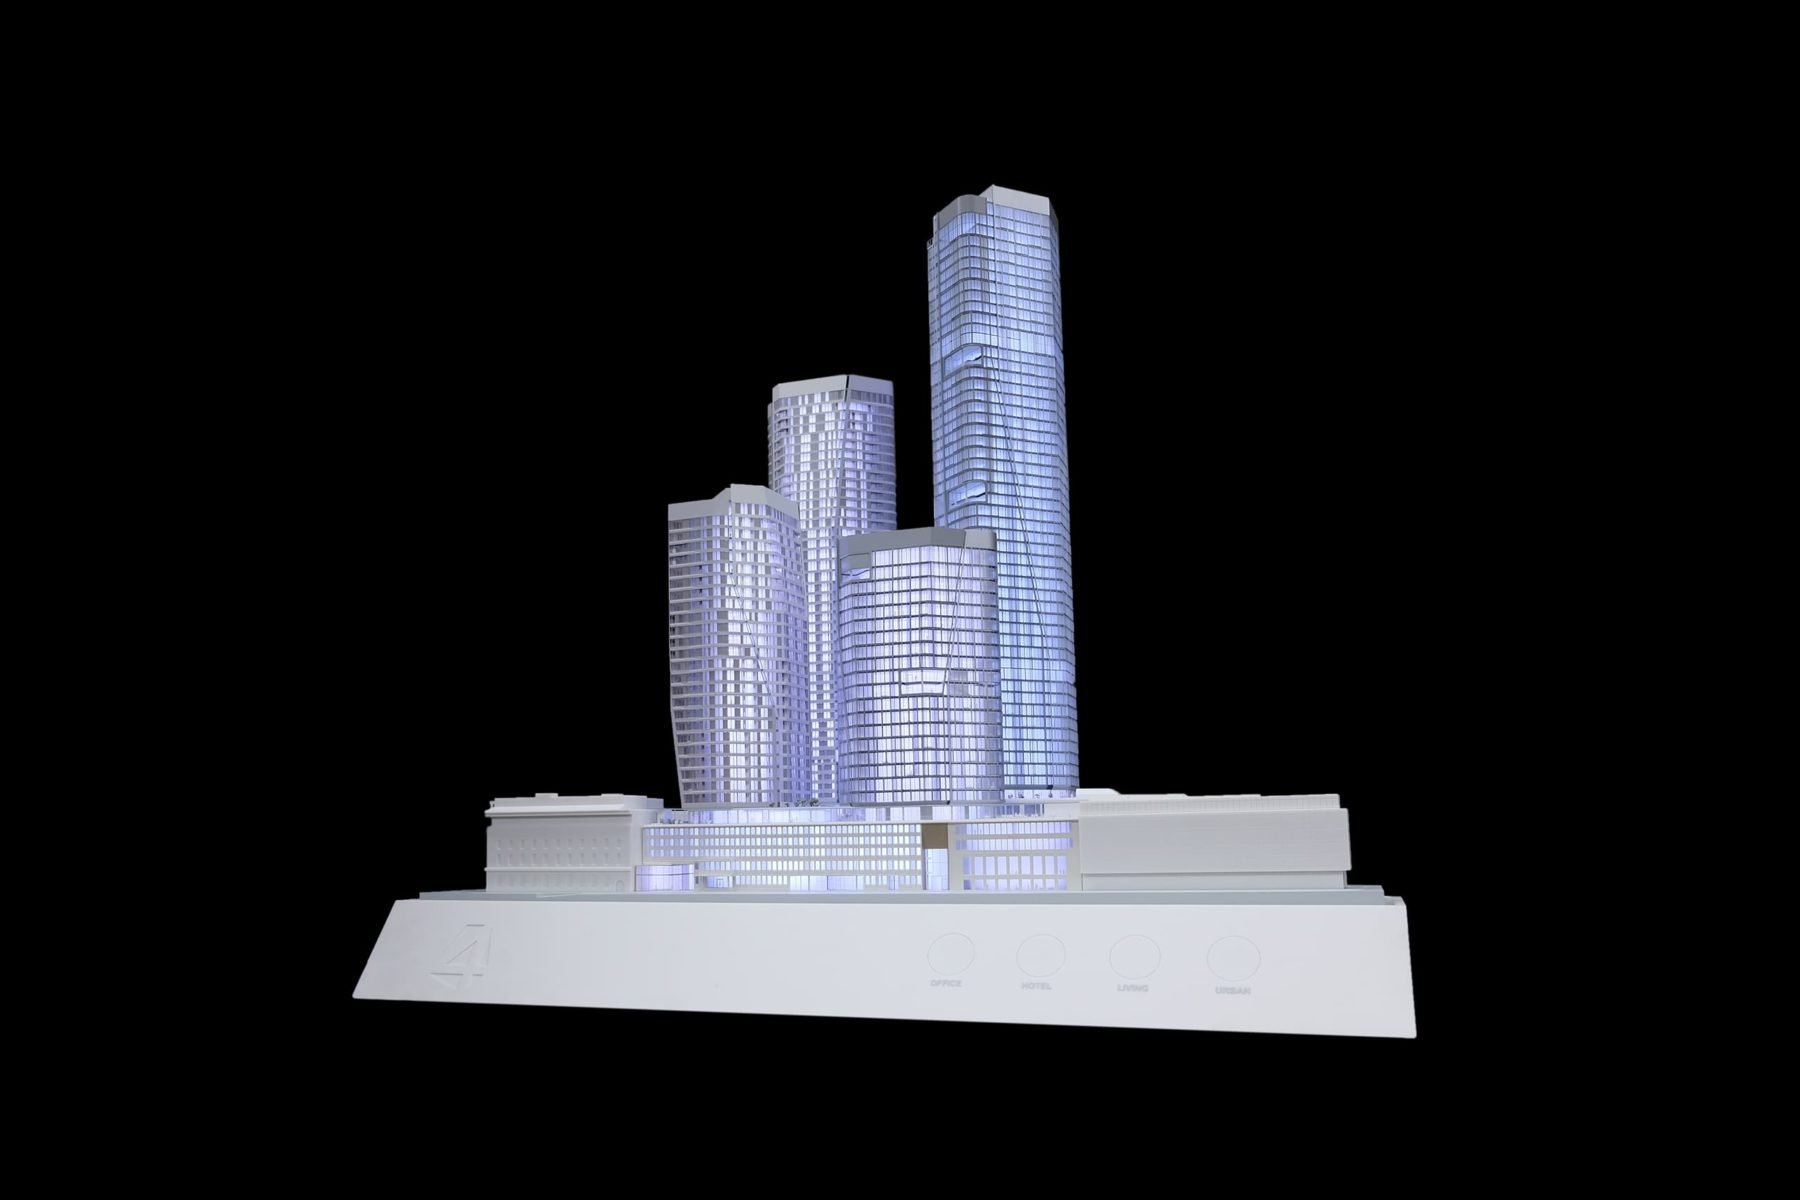 Architekturmodell des FOUR Frankfurt 2017